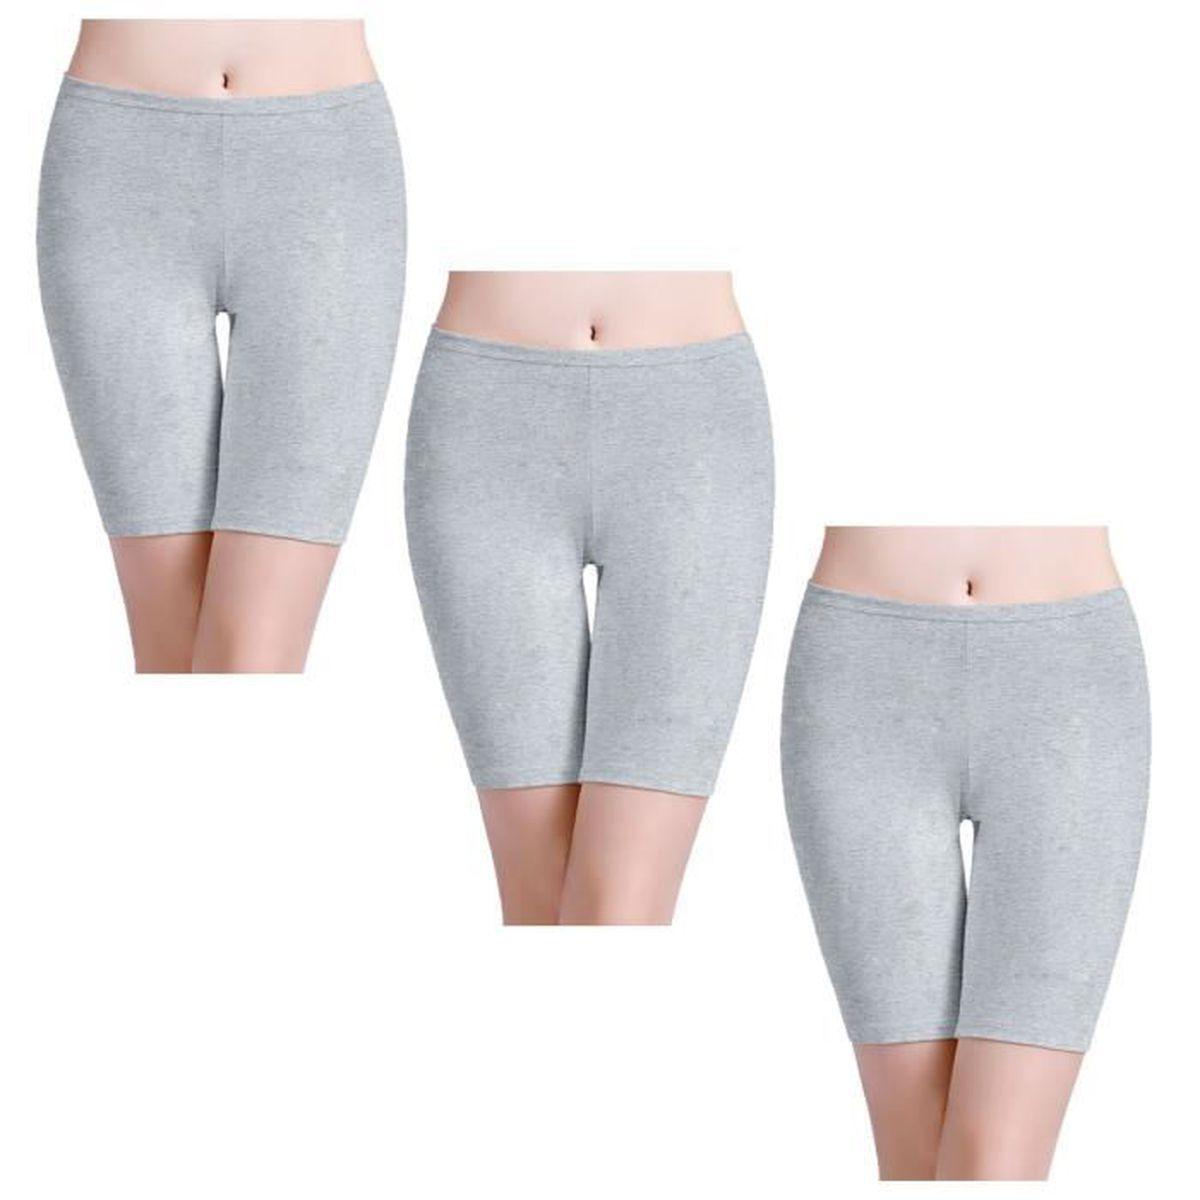 Panty Coton Cycliste Shorty Femme Long Culottes